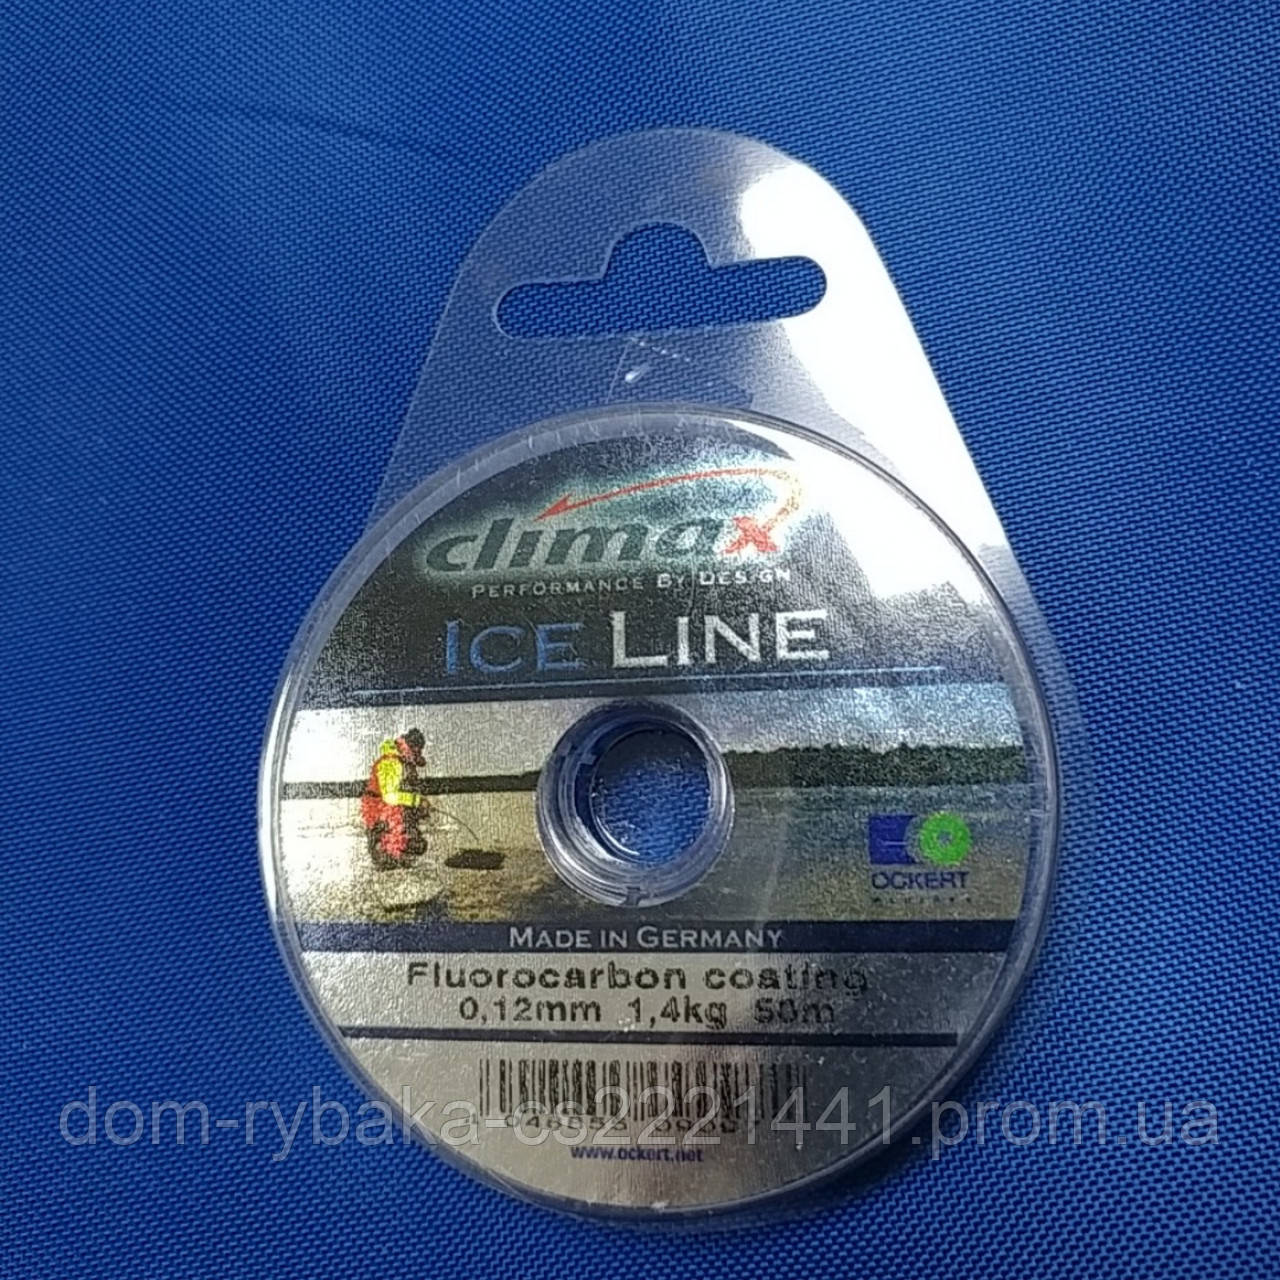 Леска Climax Ice-line Fluorocarbon coated 0.12мм 1,4kг50м(16353)